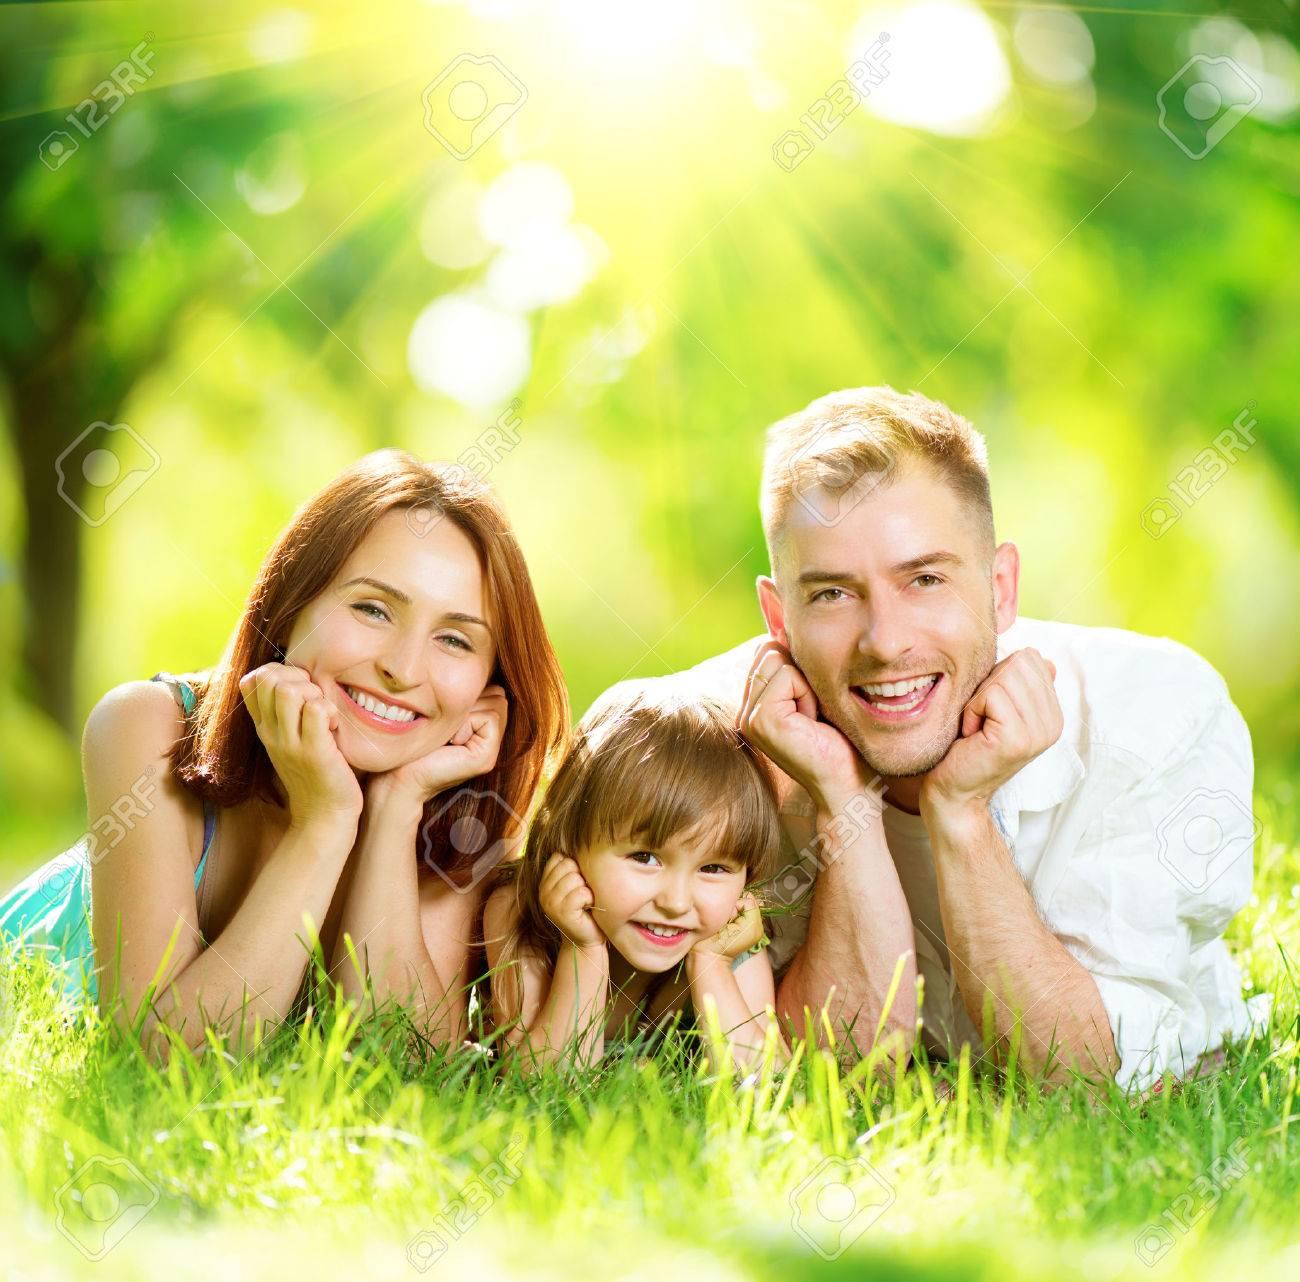 Happy joyful young family having fun in summer park - 41032593